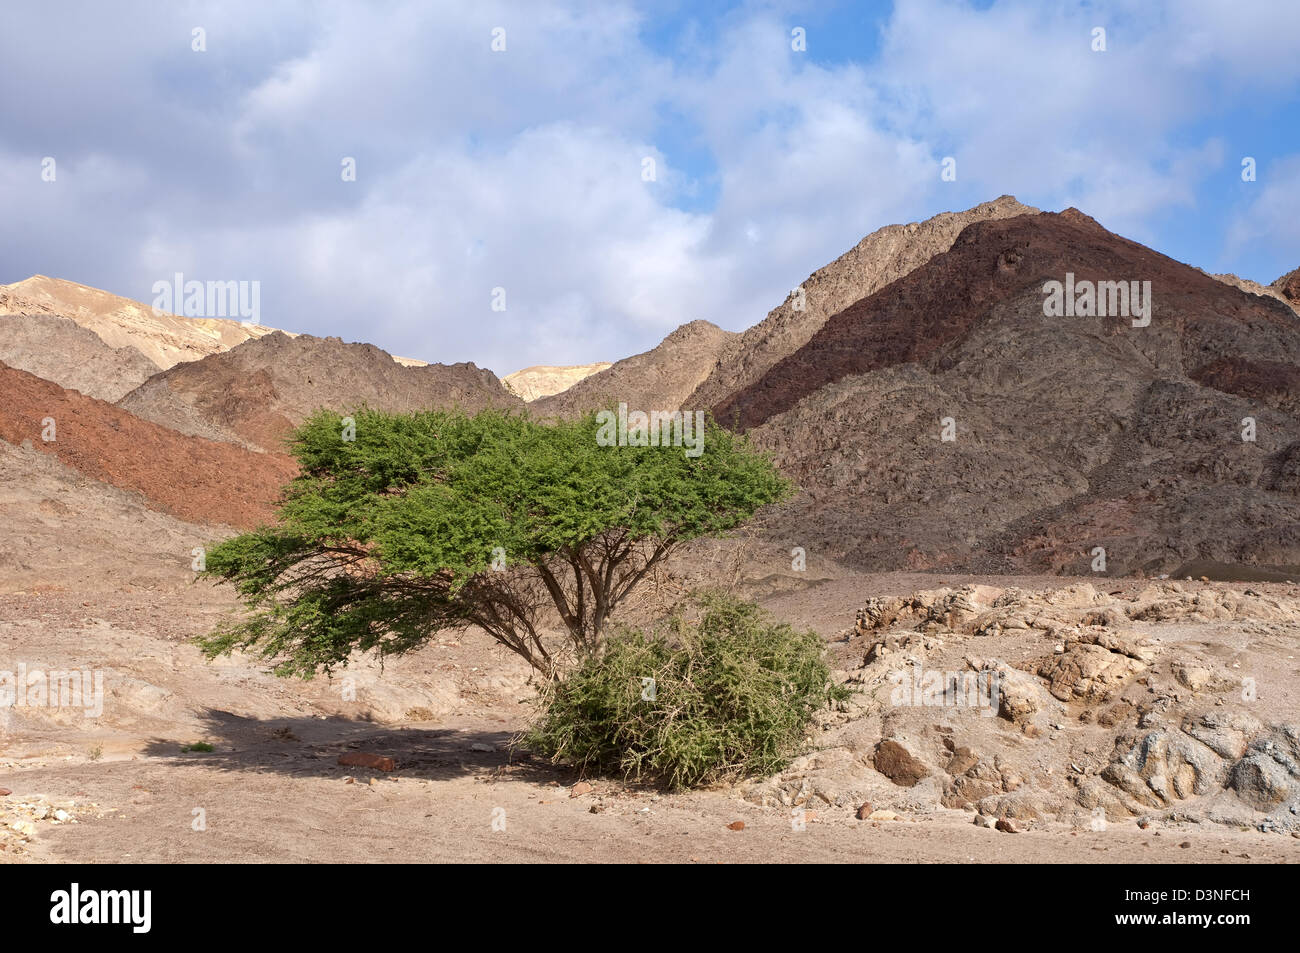 Acacia nelle montagne di Eilat, Israele Immagini Stock